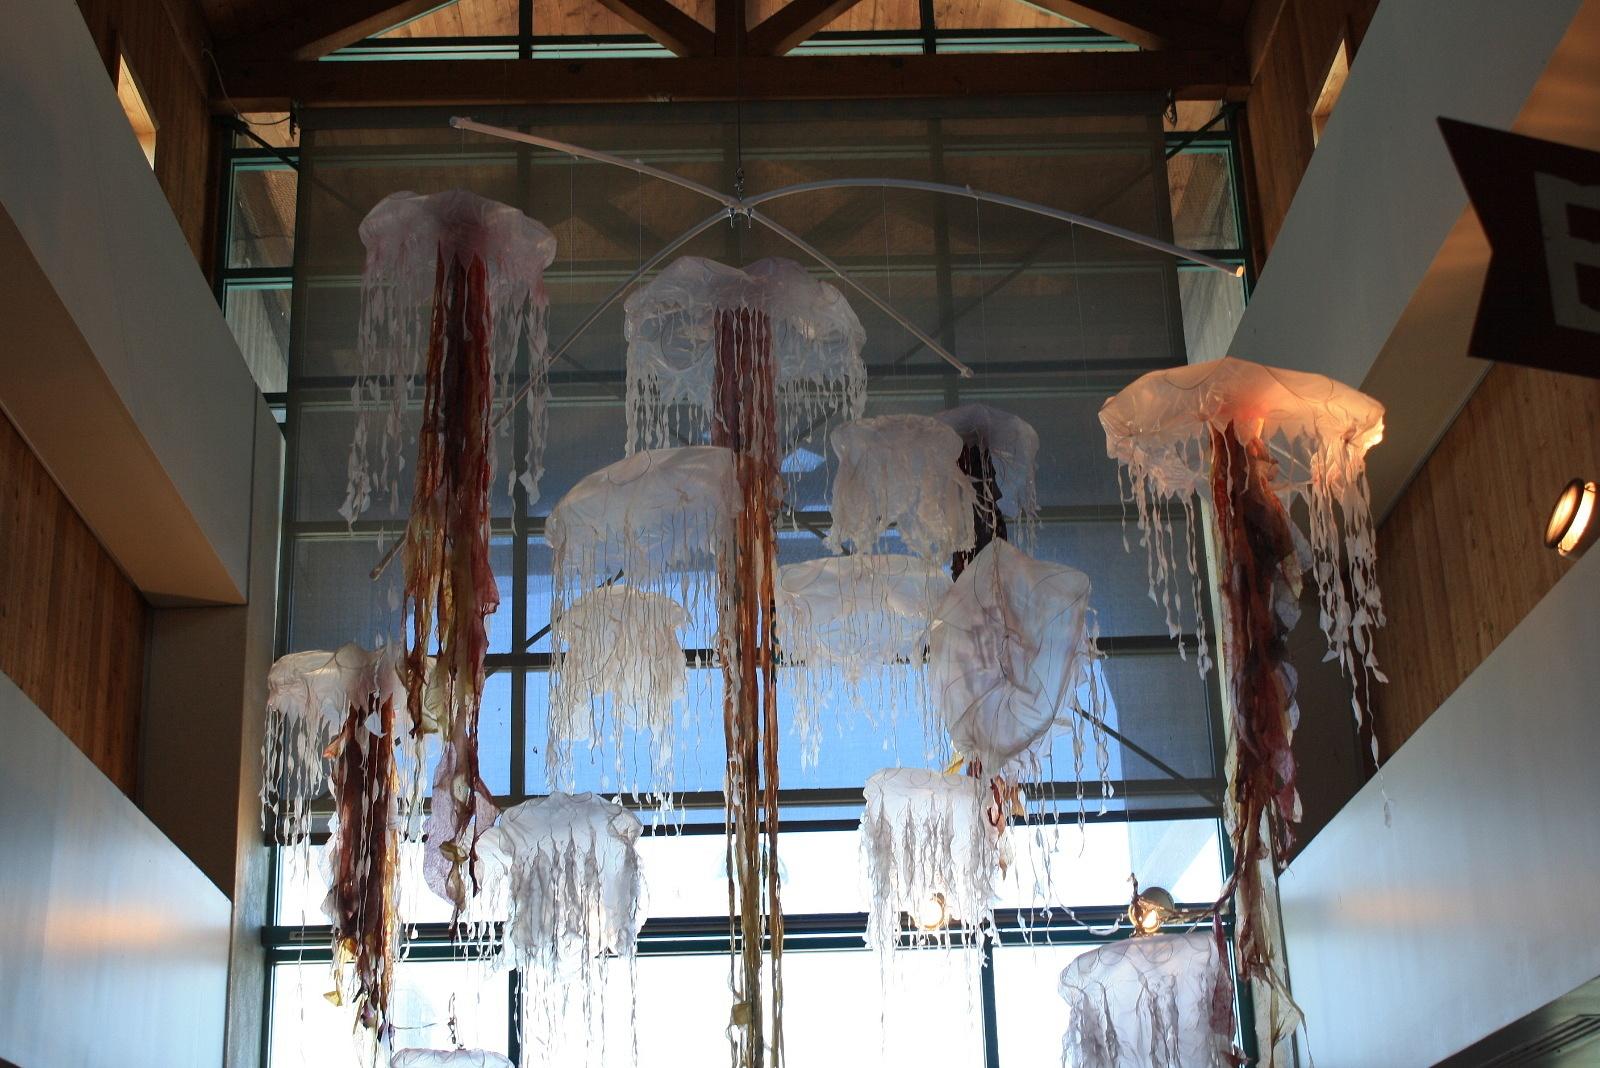 MelissaLizarraga's Gallery